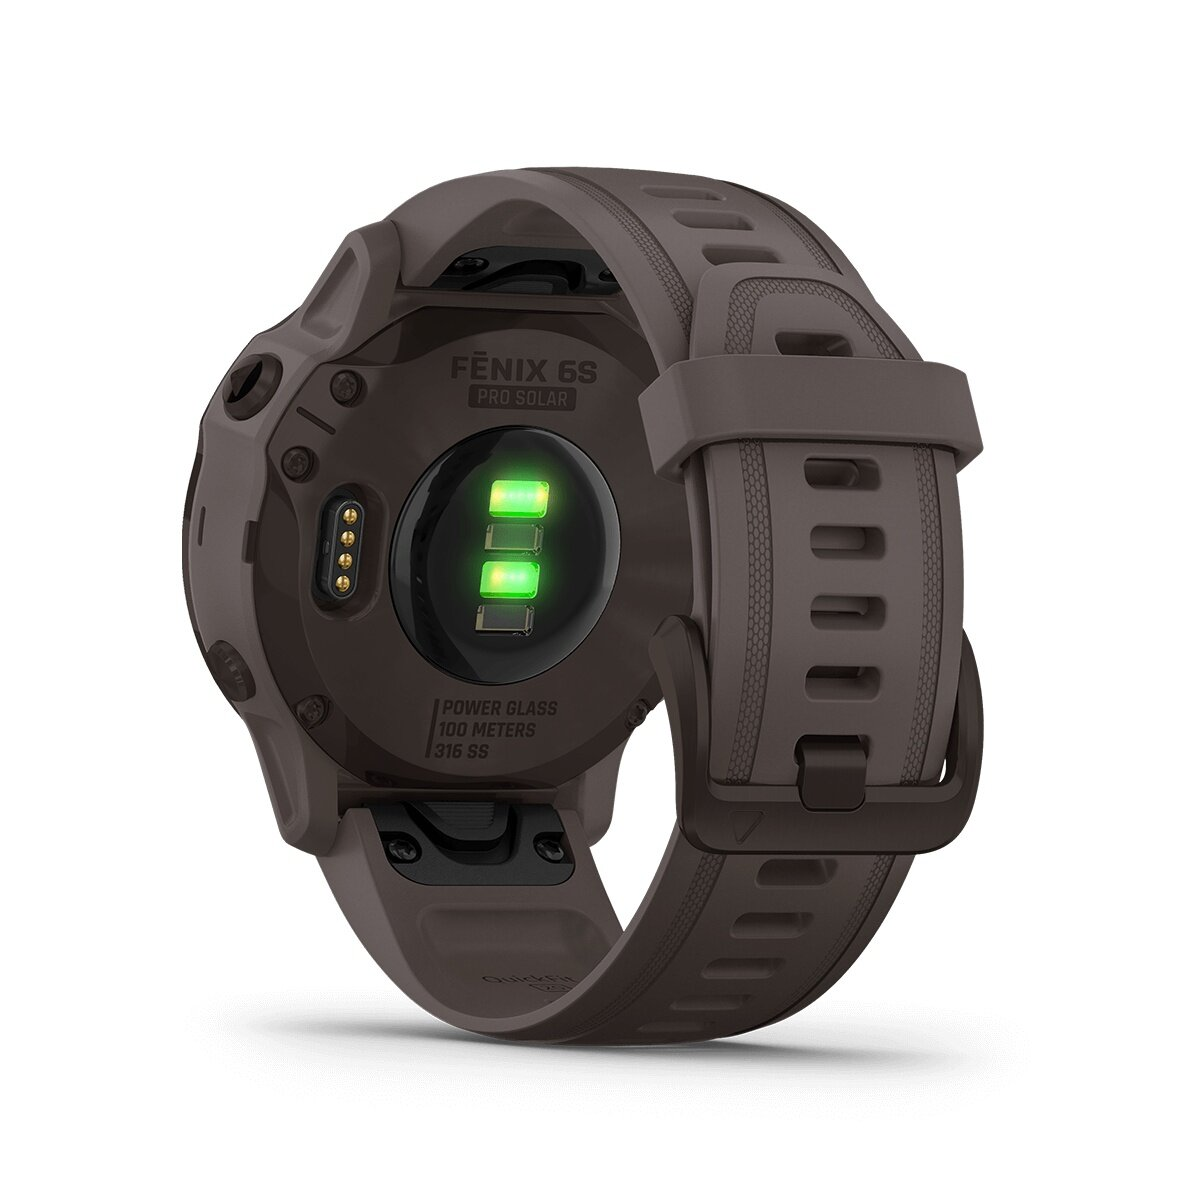 "(NEW 2019/ 2020) Garmin Fenix 6s, Fenix 6s Pro Solar (NEW) Multisport GPS Smartwatch With Elevateâ""¢ wrist heart rate technology"